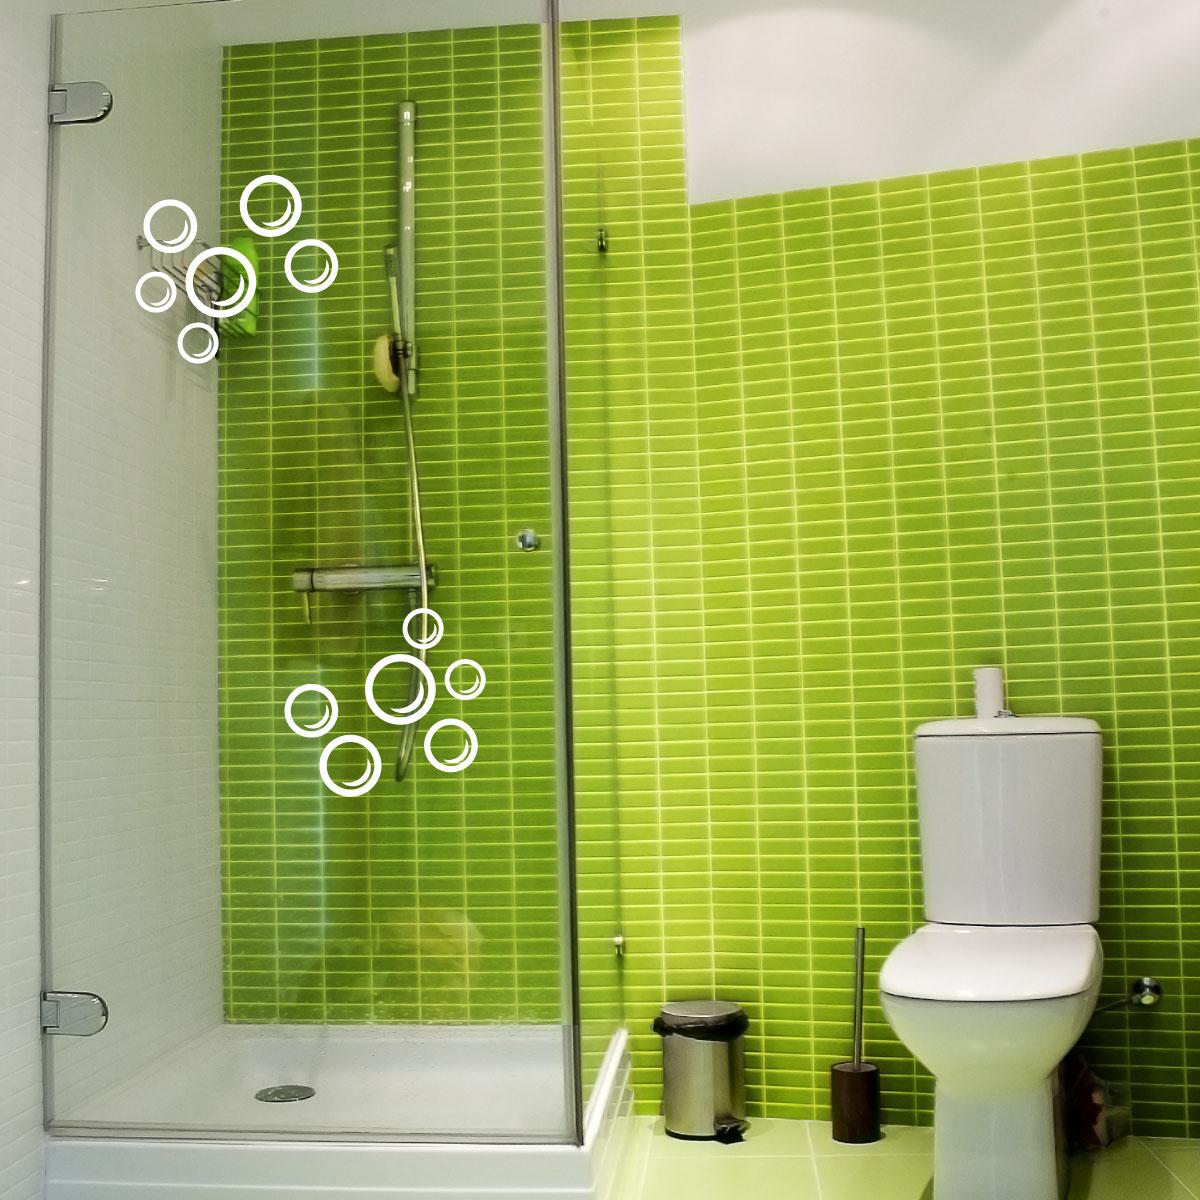 stickers muraux pour salle de bain sticker mural bulles ambiance. Black Bedroom Furniture Sets. Home Design Ideas